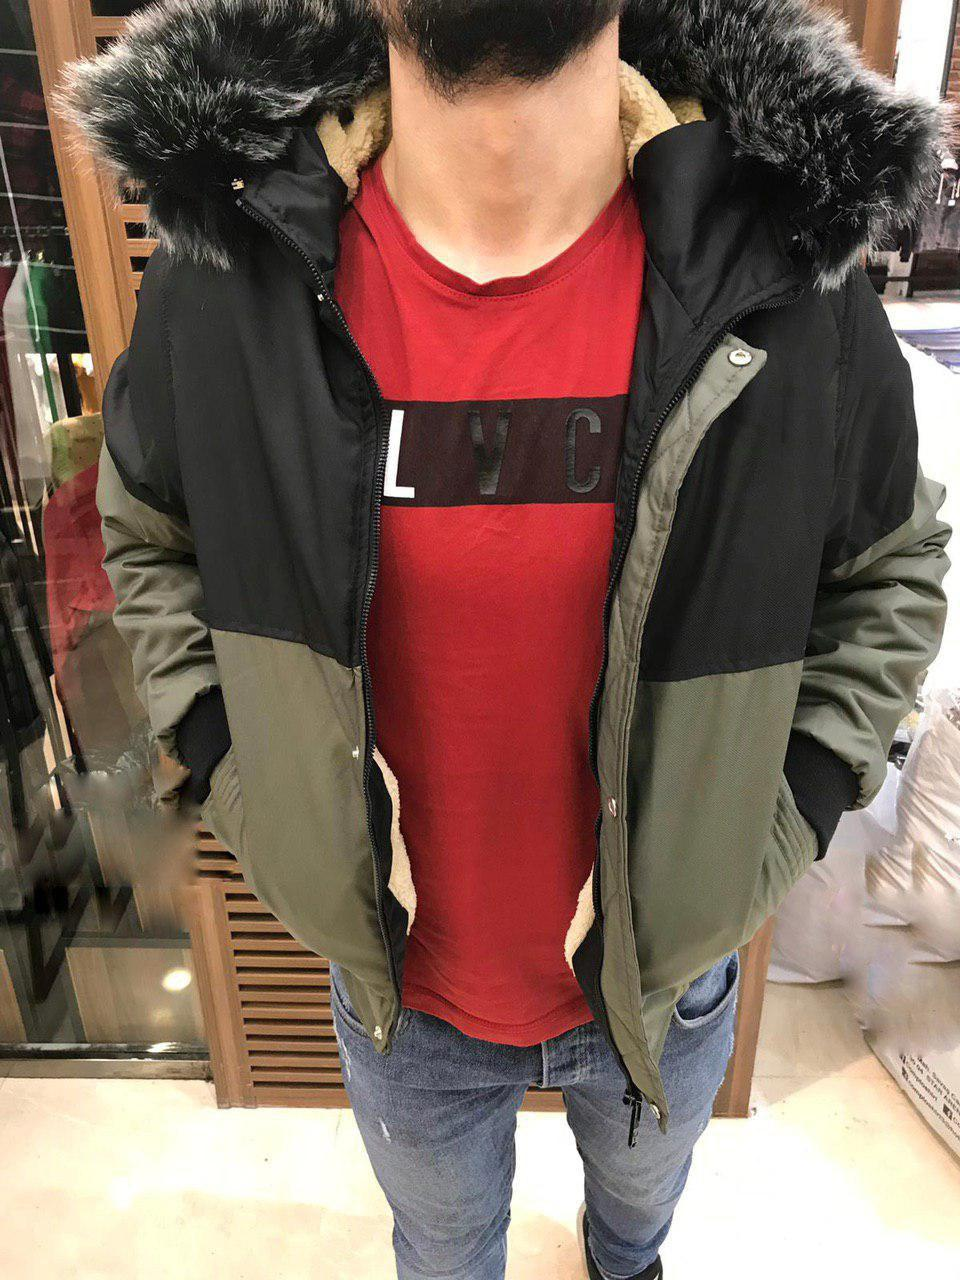 Мужская зимняя куртка до -10, две расцветки